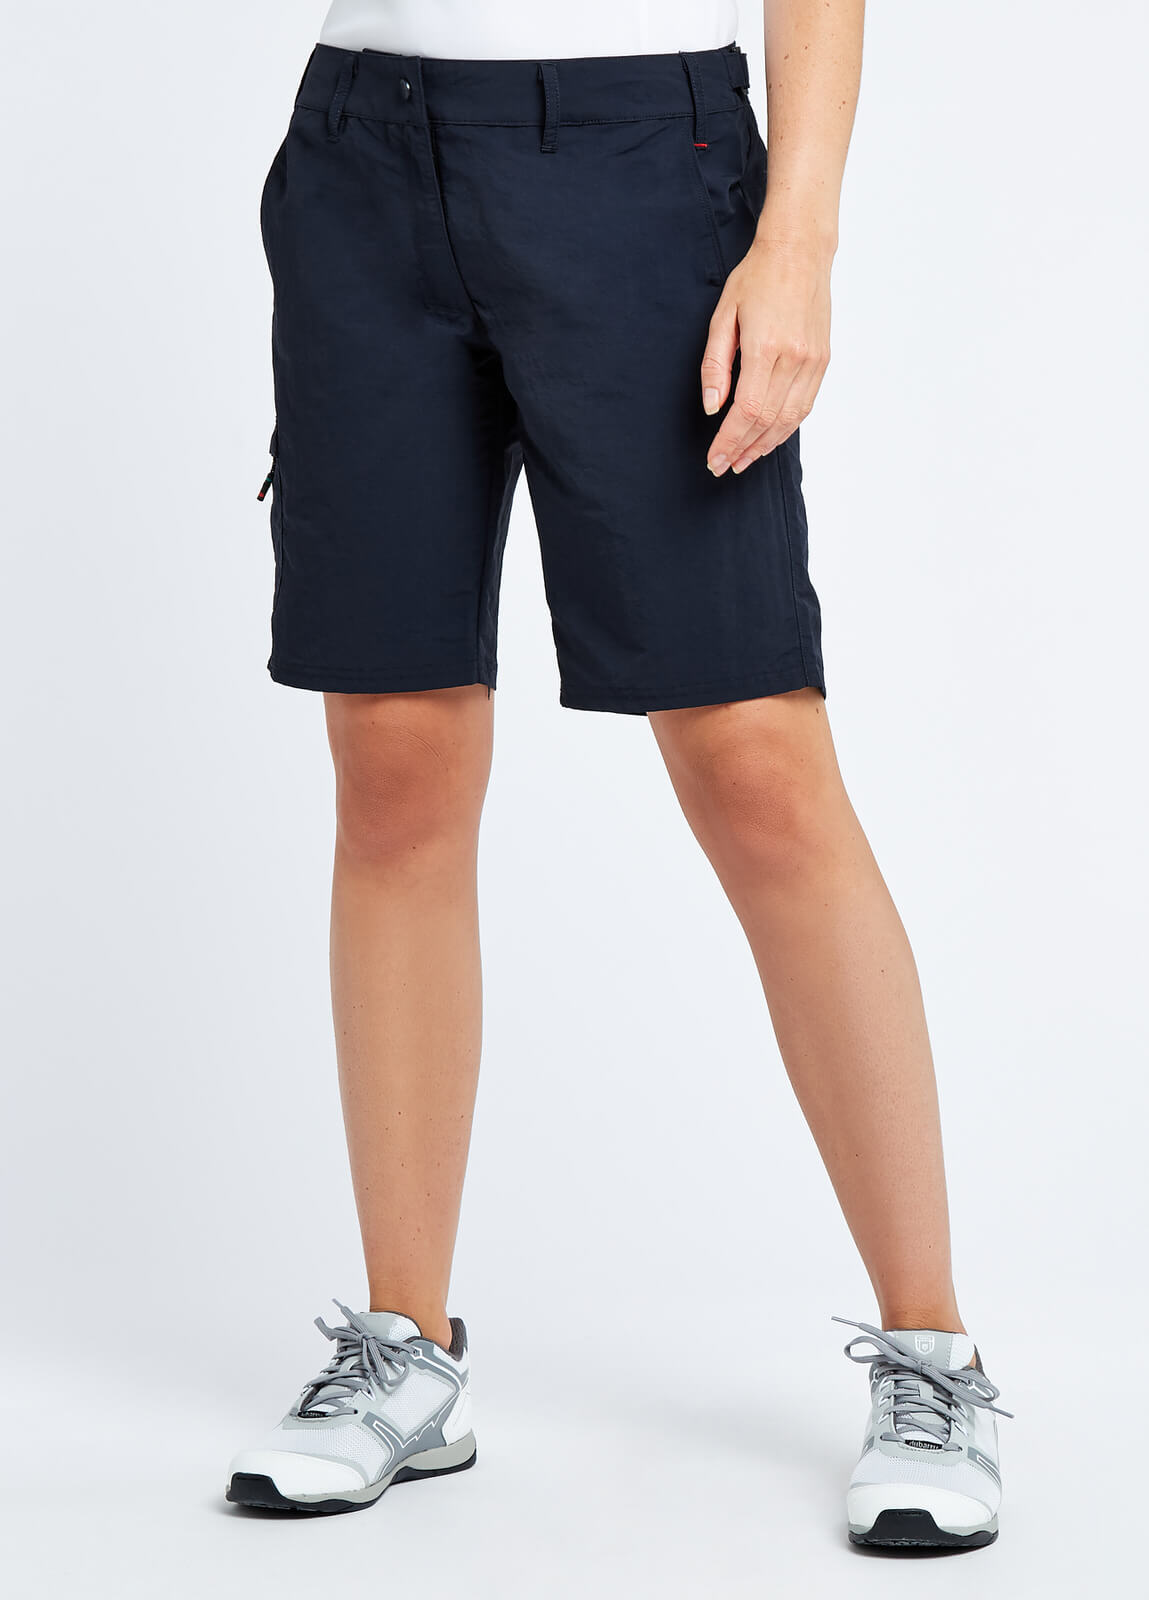 Minorca Womens Crew Shorts - Navy